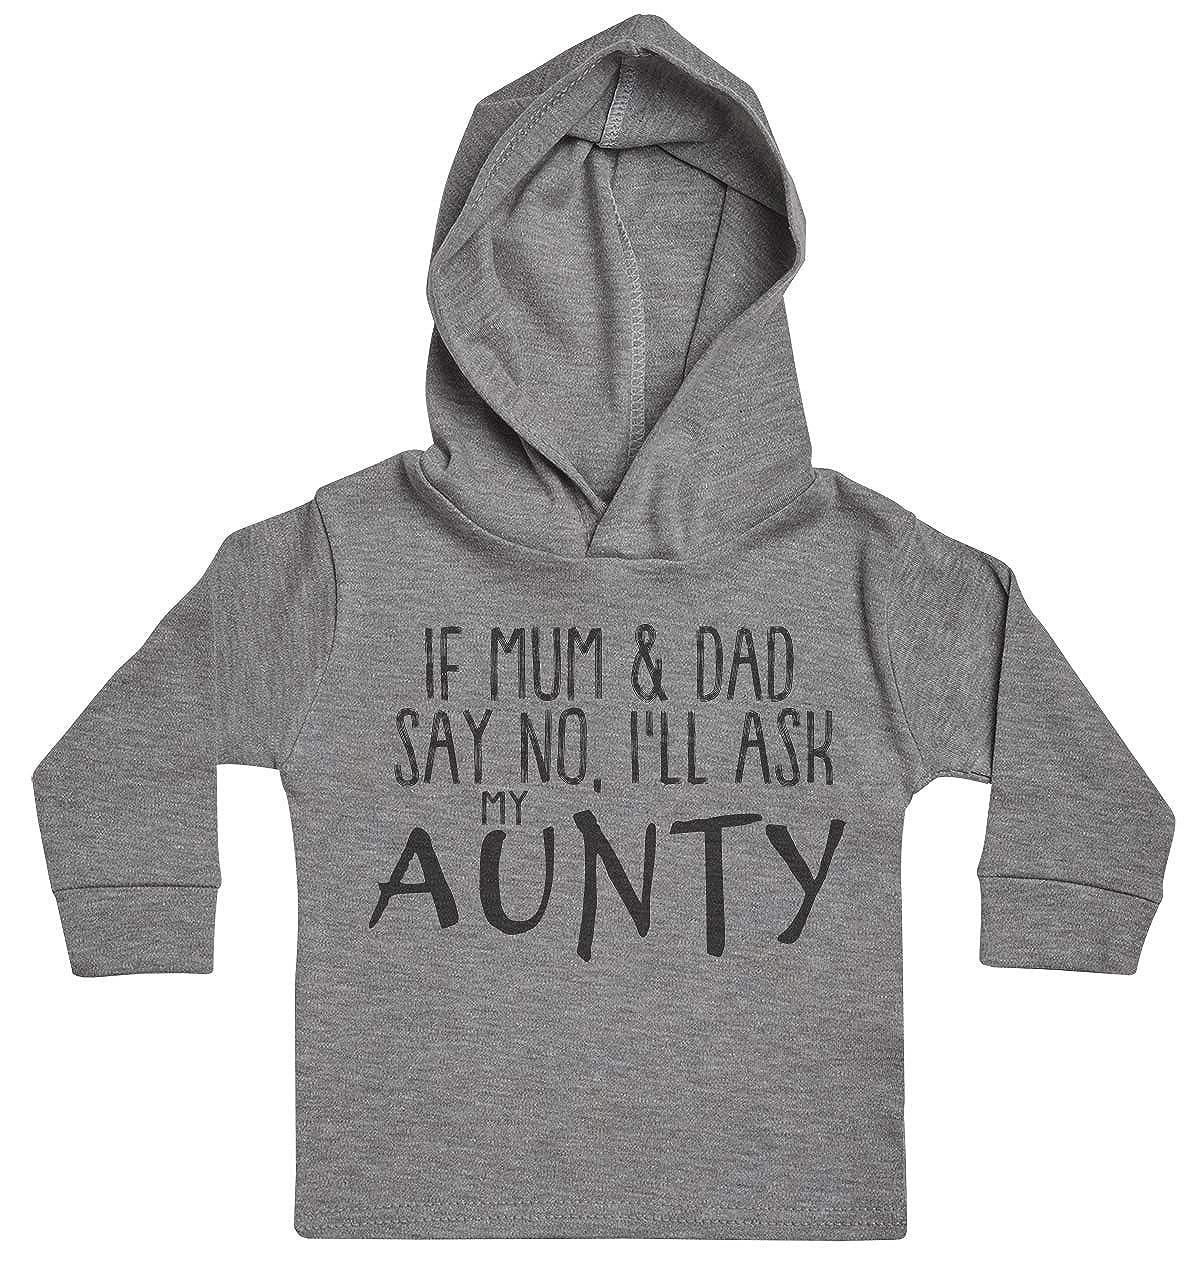 Baby Clothing Baby Gift Ill Ask My Aunty Baby Boy Hoody Baby Girl Hoody If Mum /& Dad Say No Baby Hoody